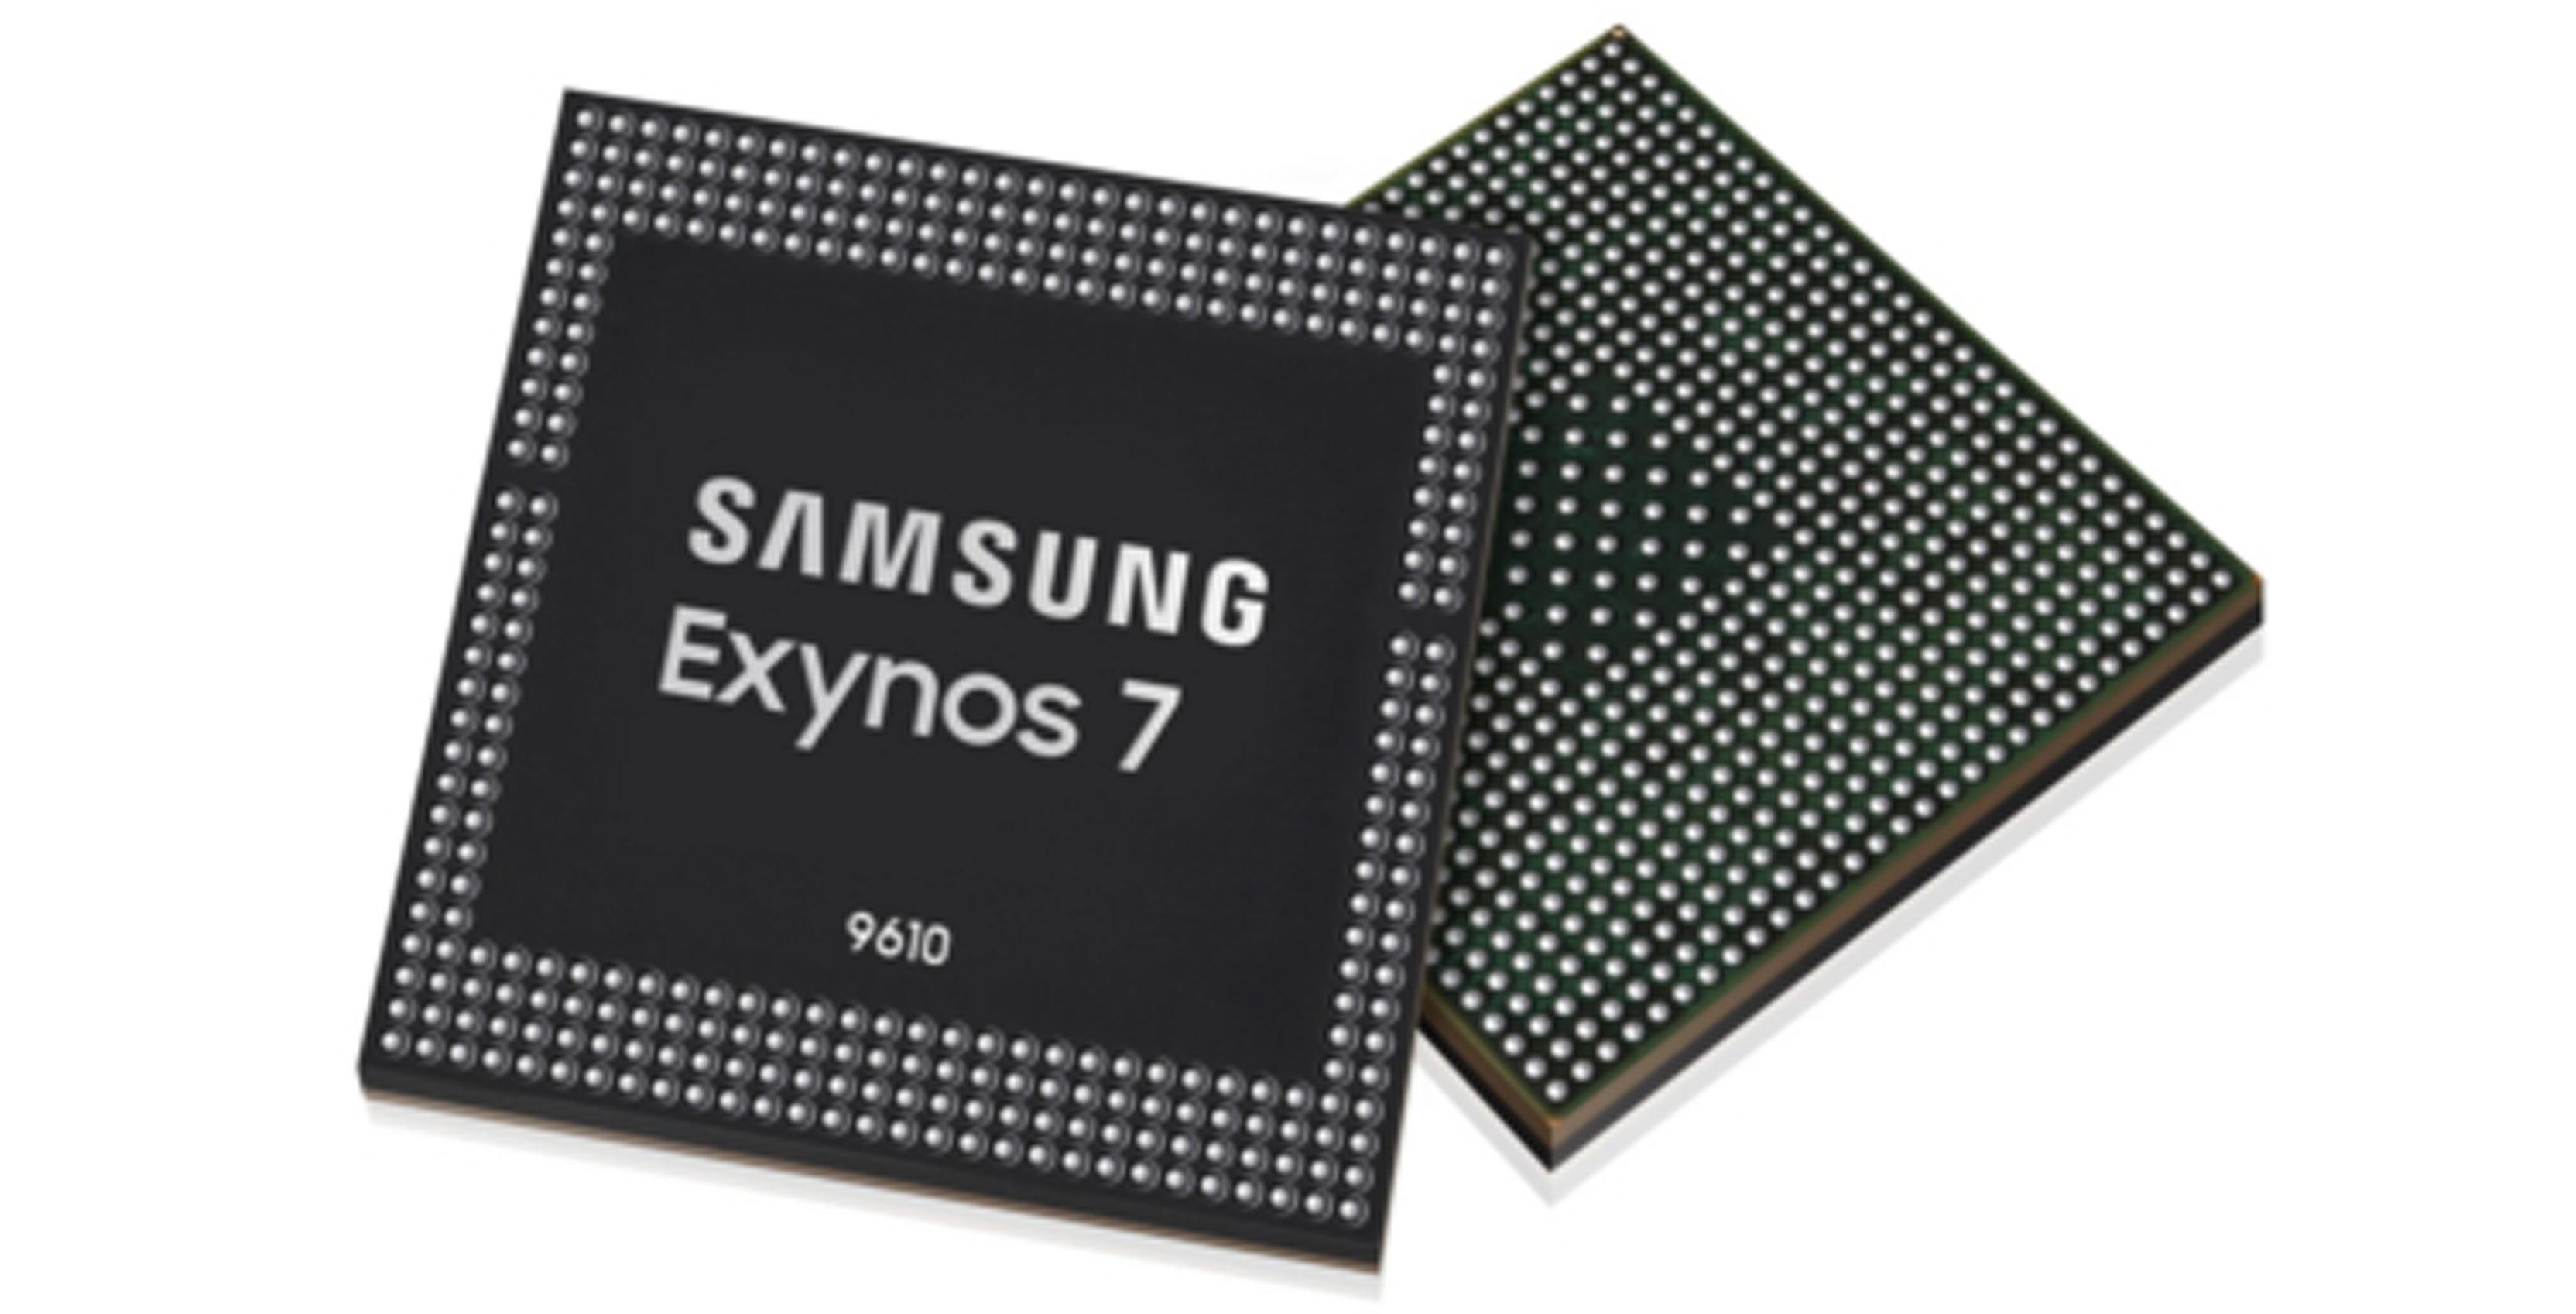 Samsung's new mid-range Exynos 9610 chipset